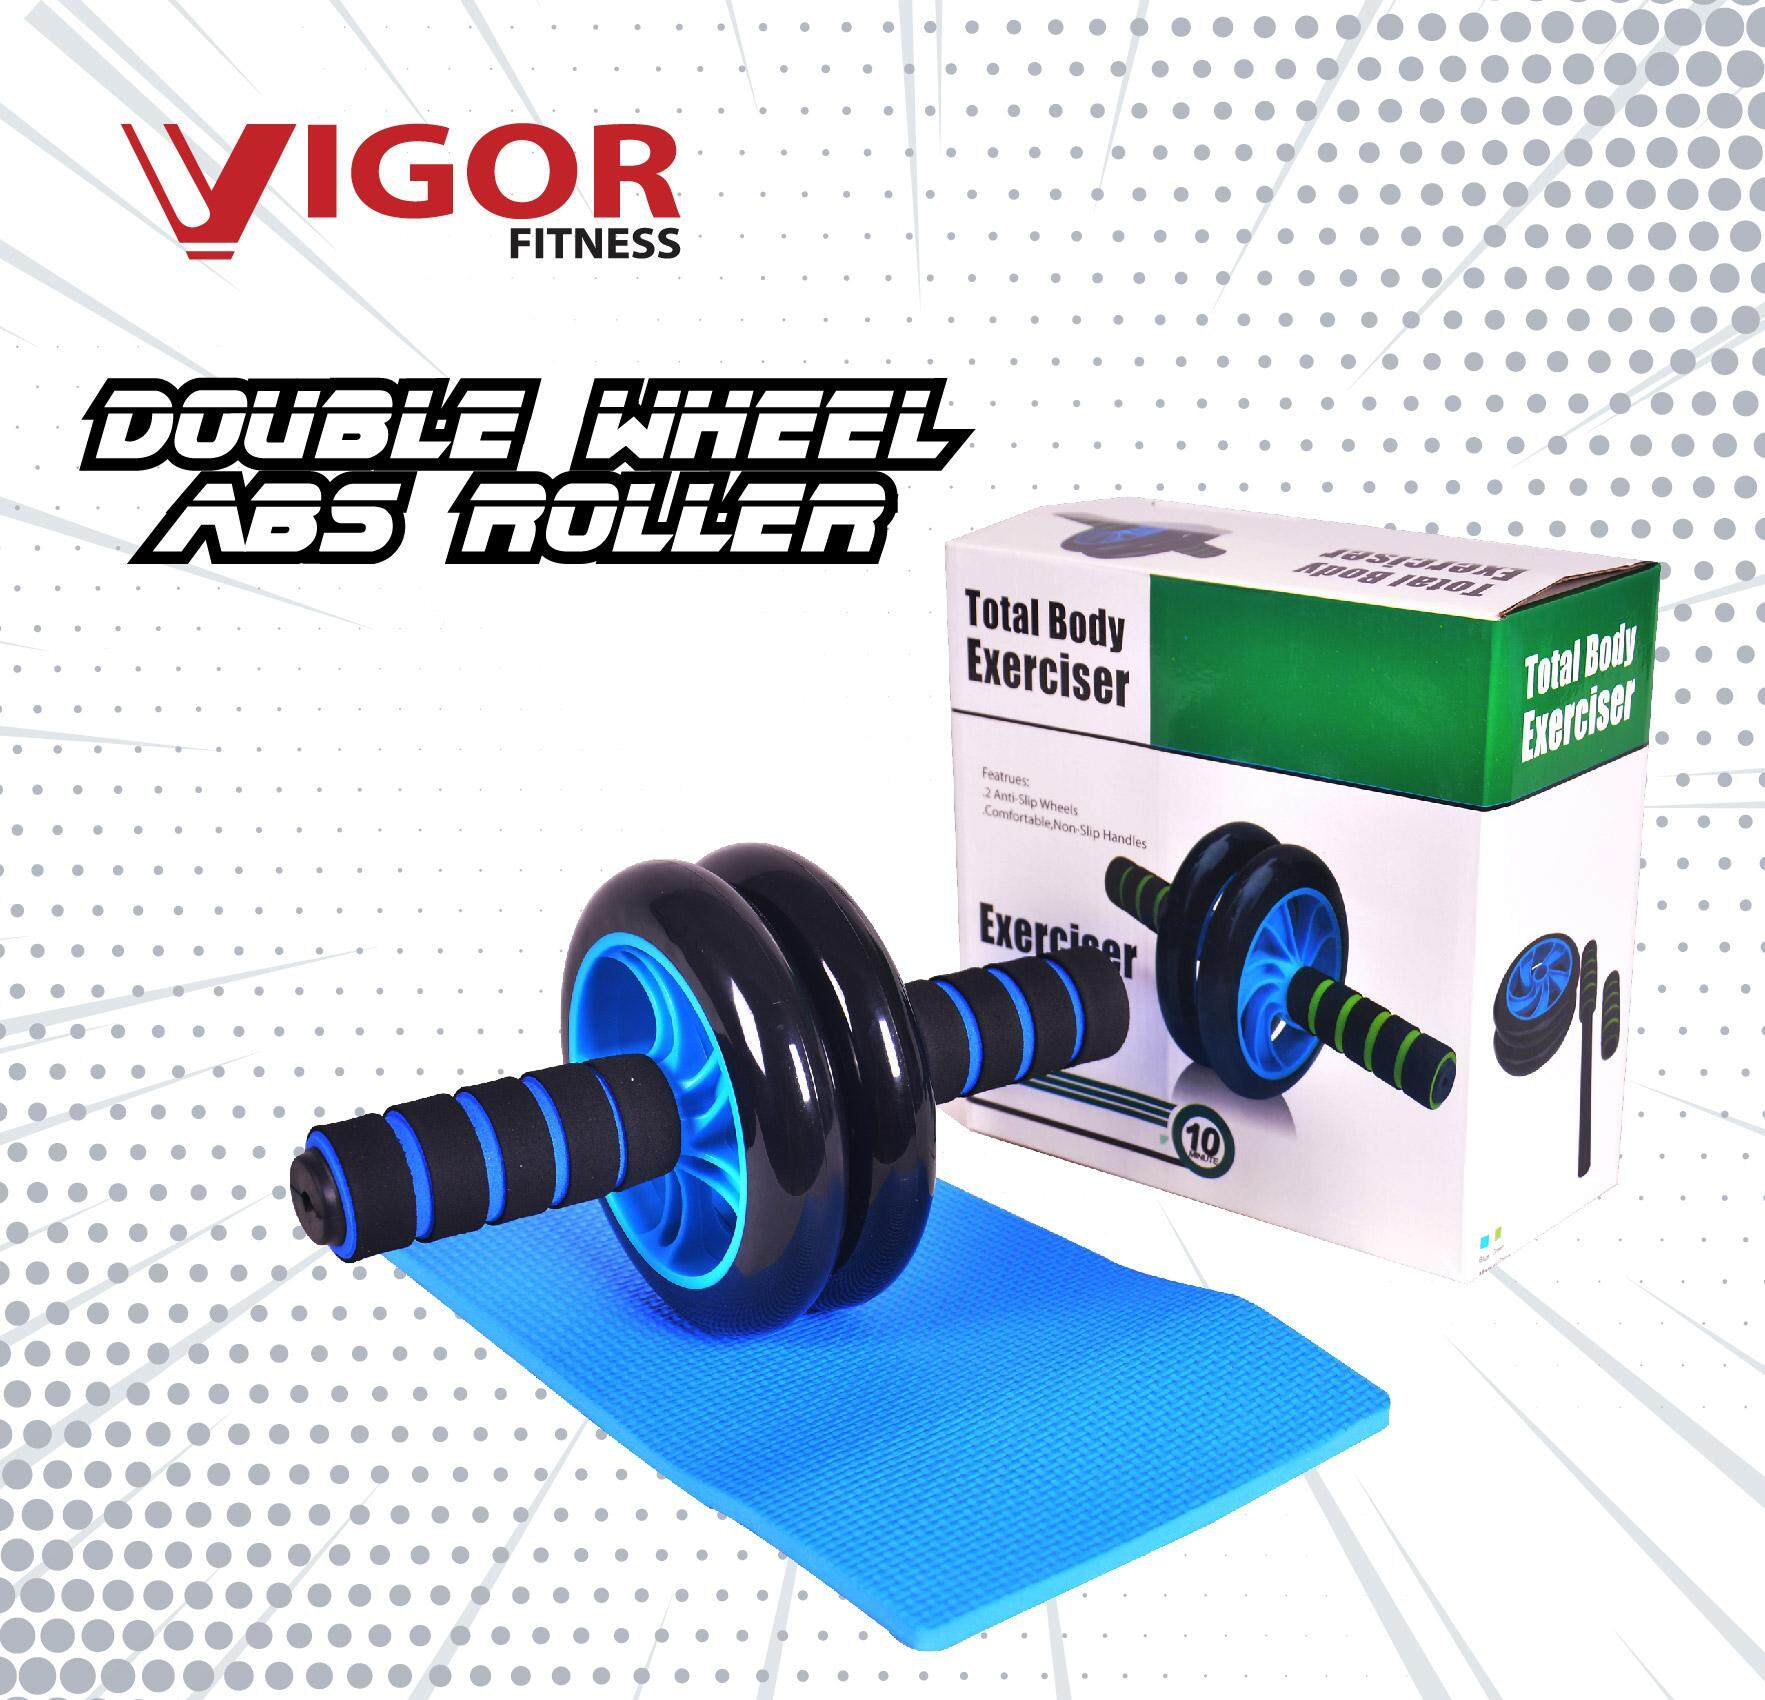 ABS ROLLER-01.jpg